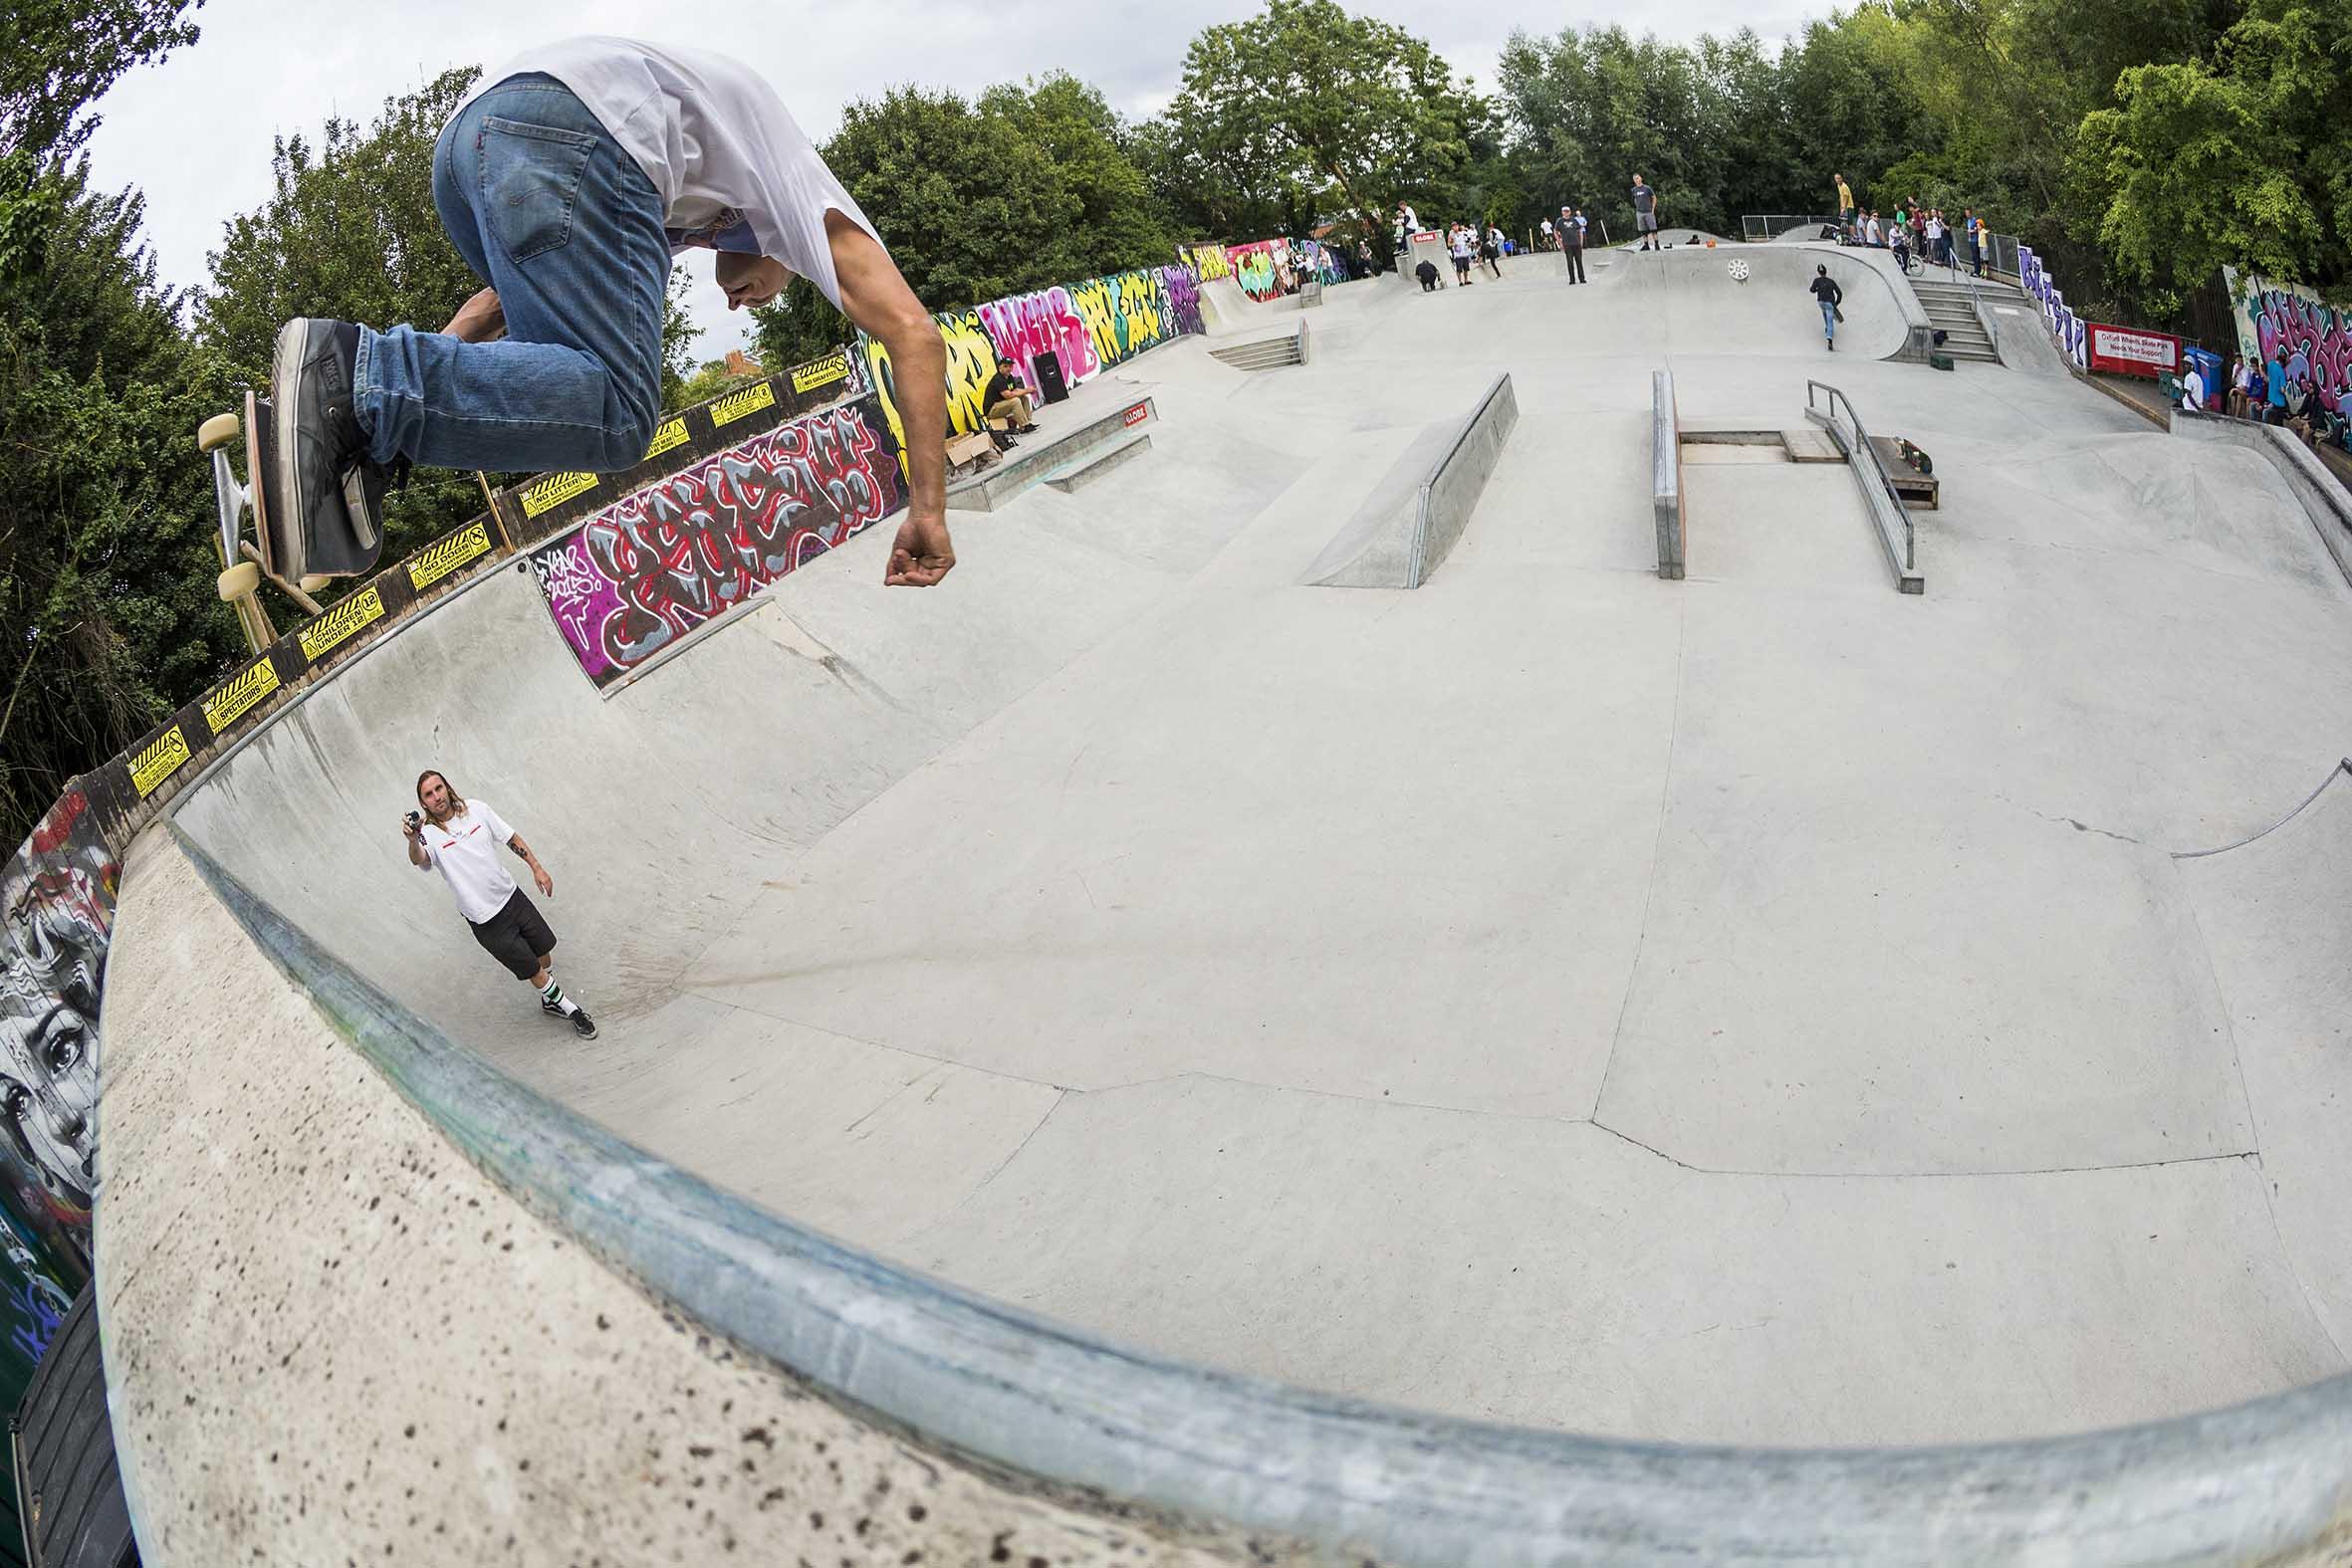 Greg Nowik - backside air